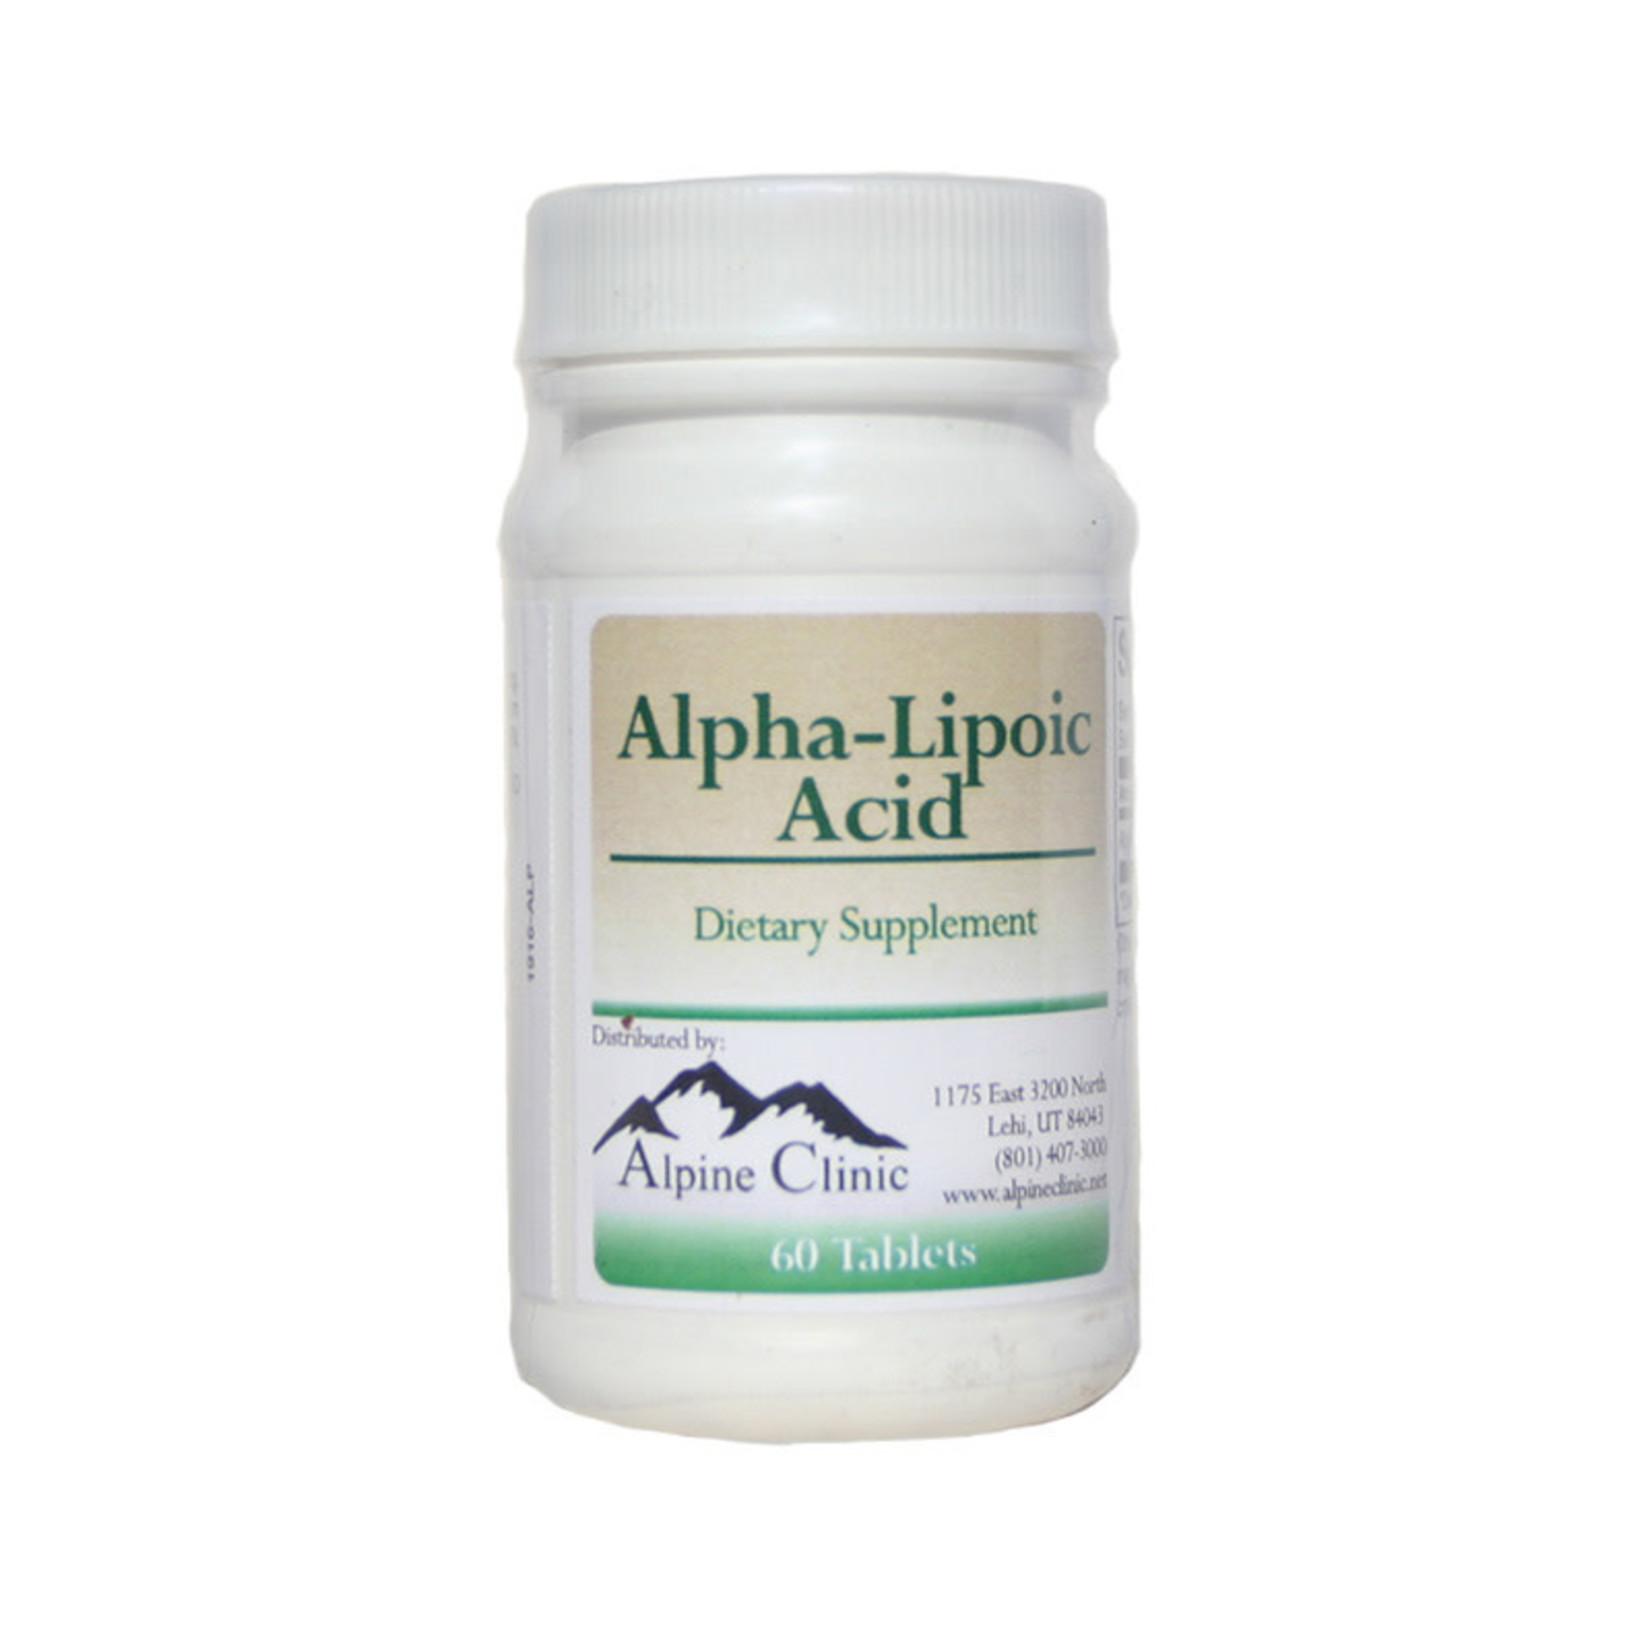 Alpine Clinic Private Label Alpha-Lipoic Acid